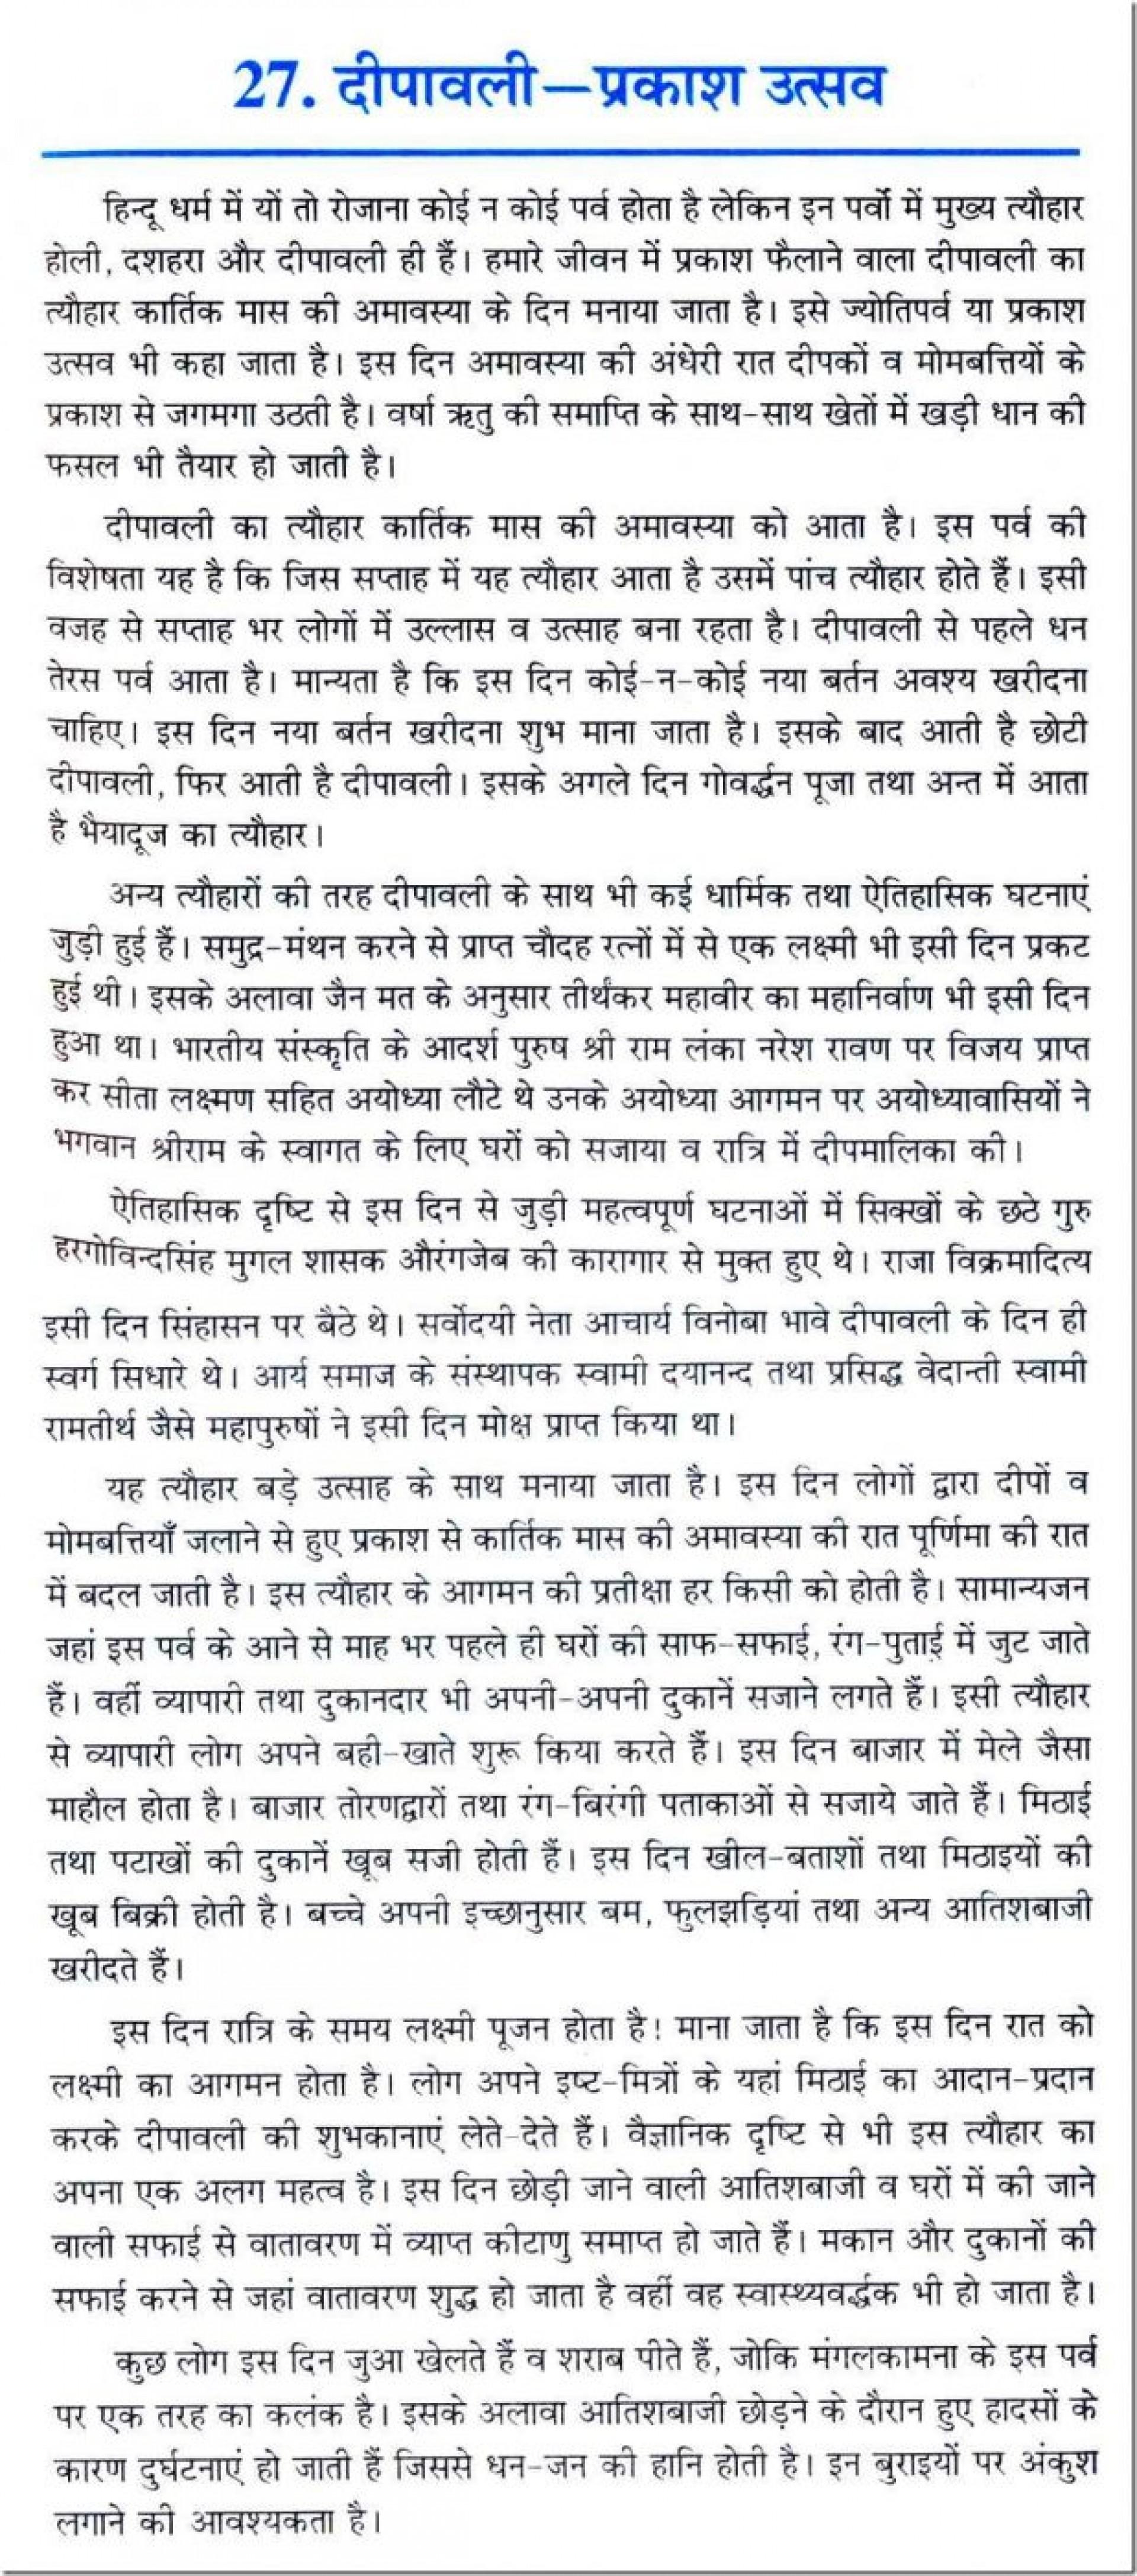 Diwali essay in sanskrit language